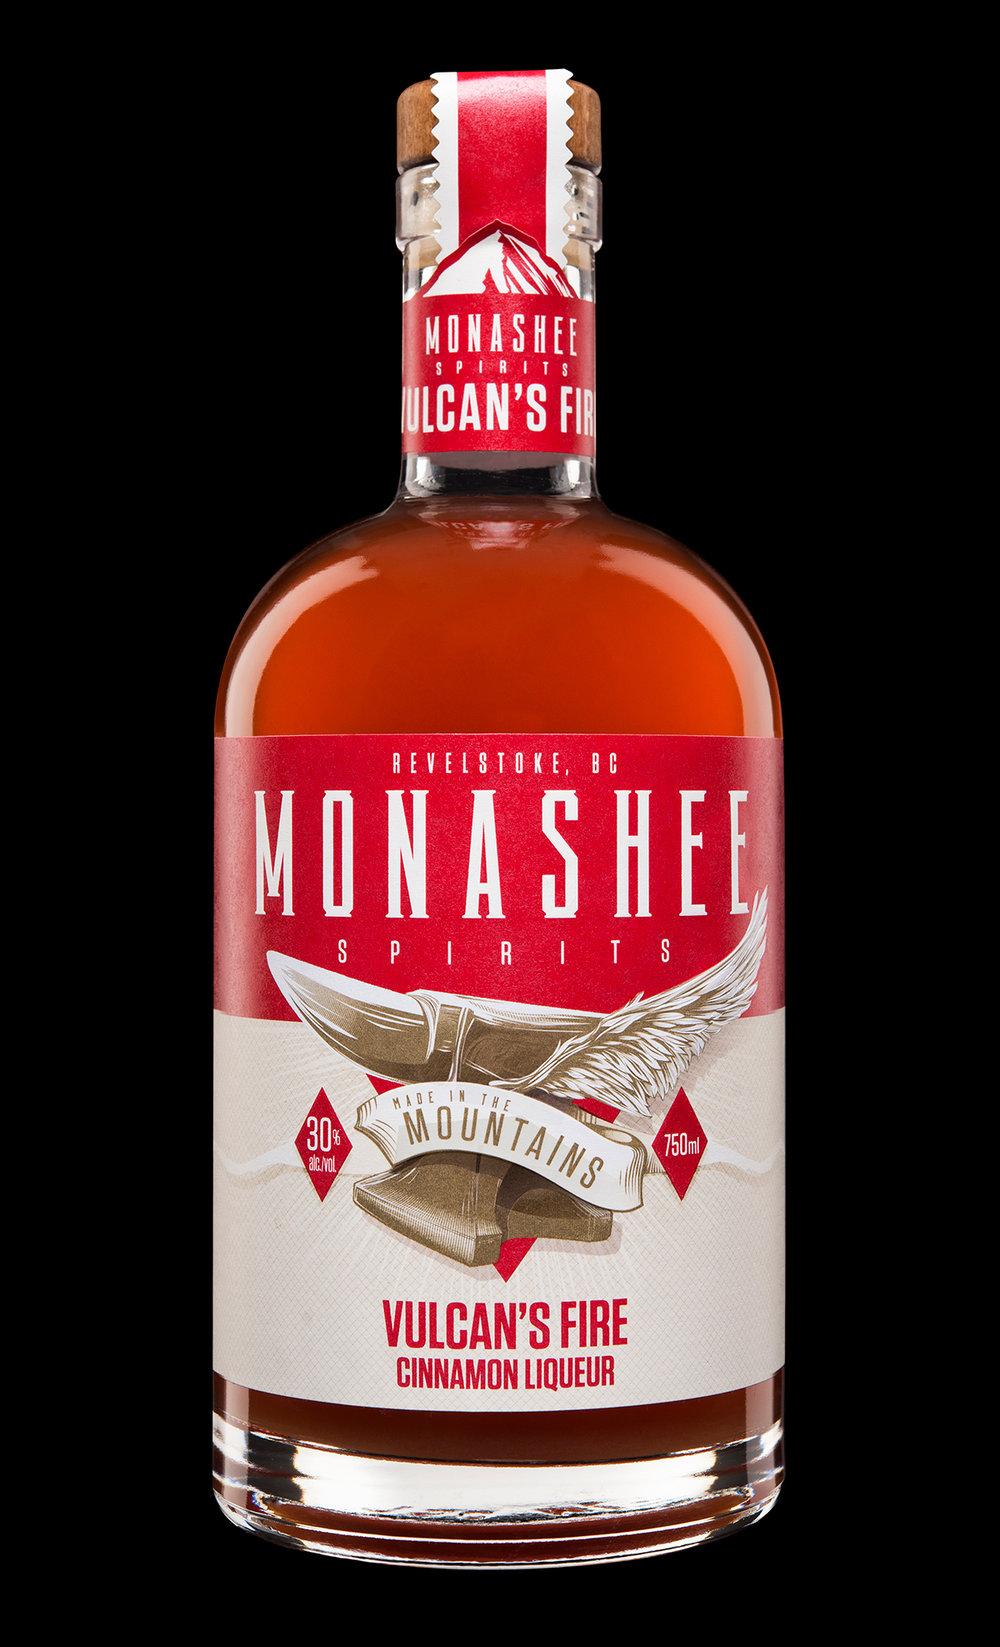 monashee-05.jpg